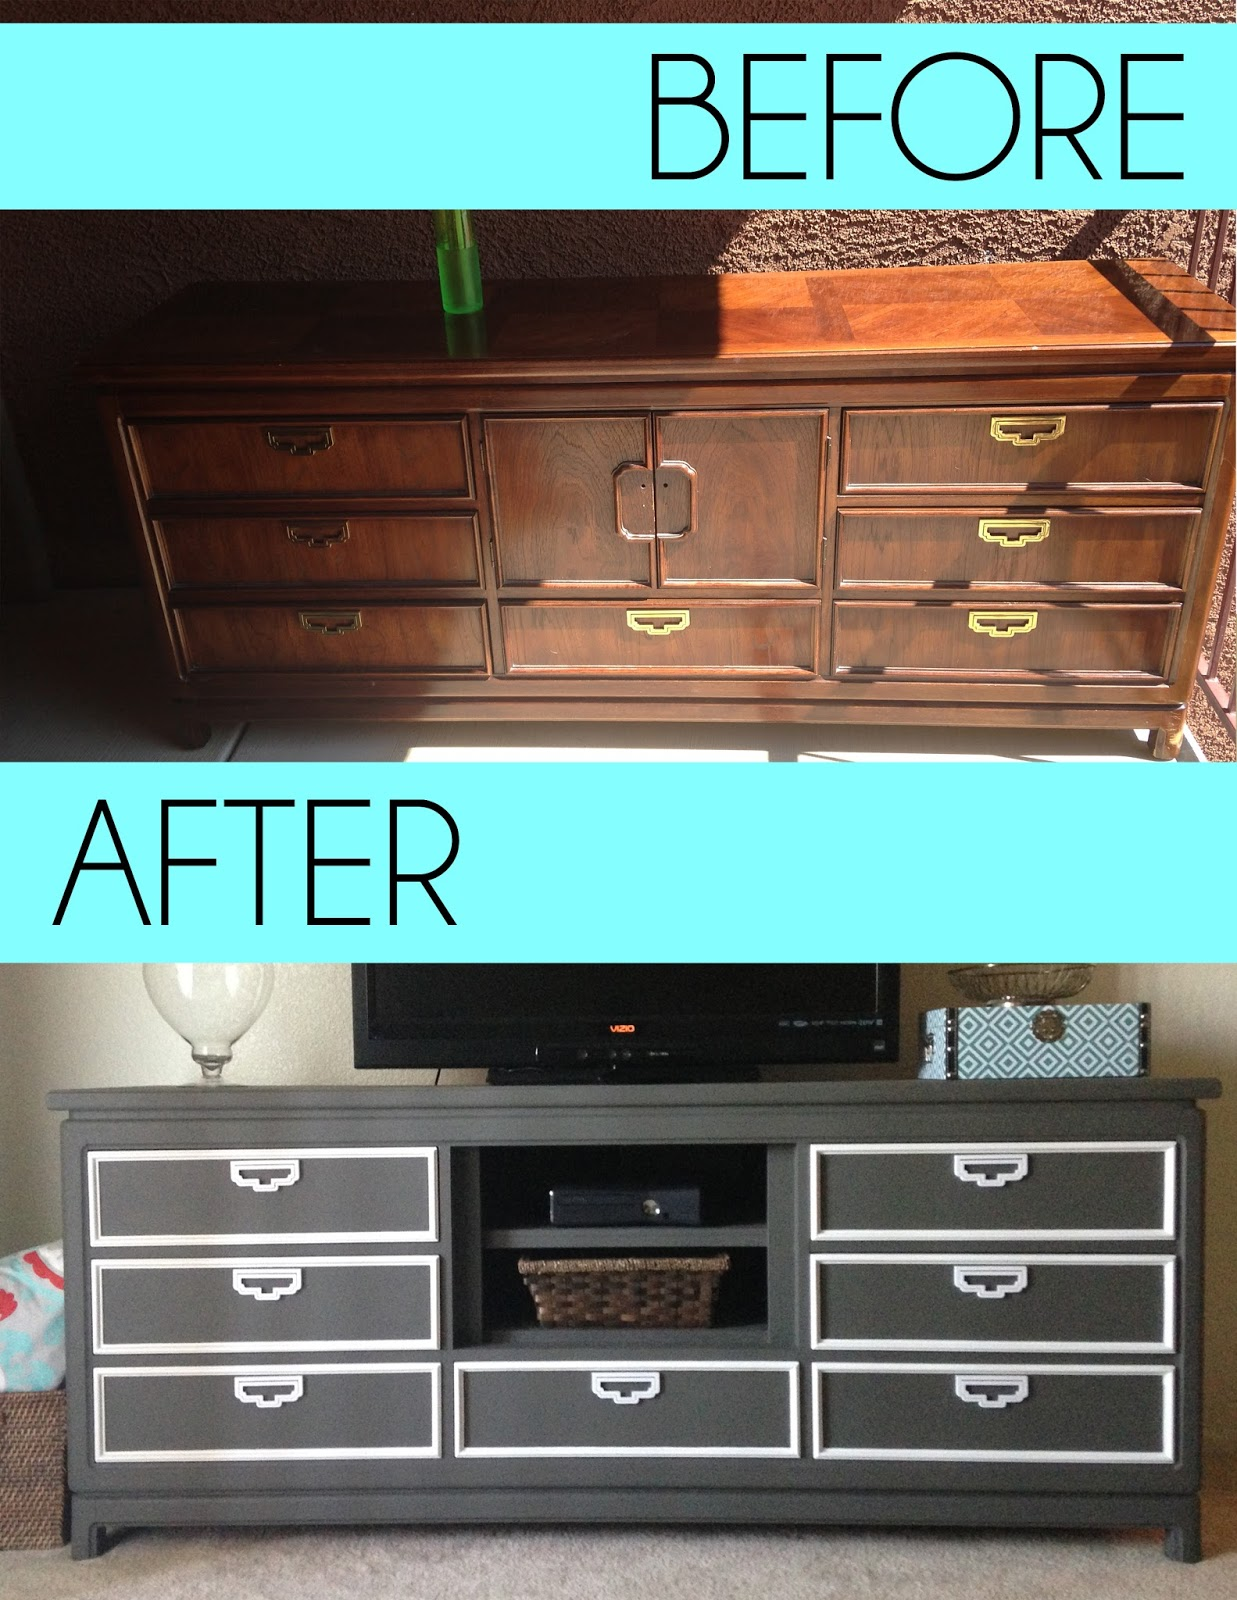 ottoman pin ideas center entertainment into turn an furniture pinterest turned diy a dresser